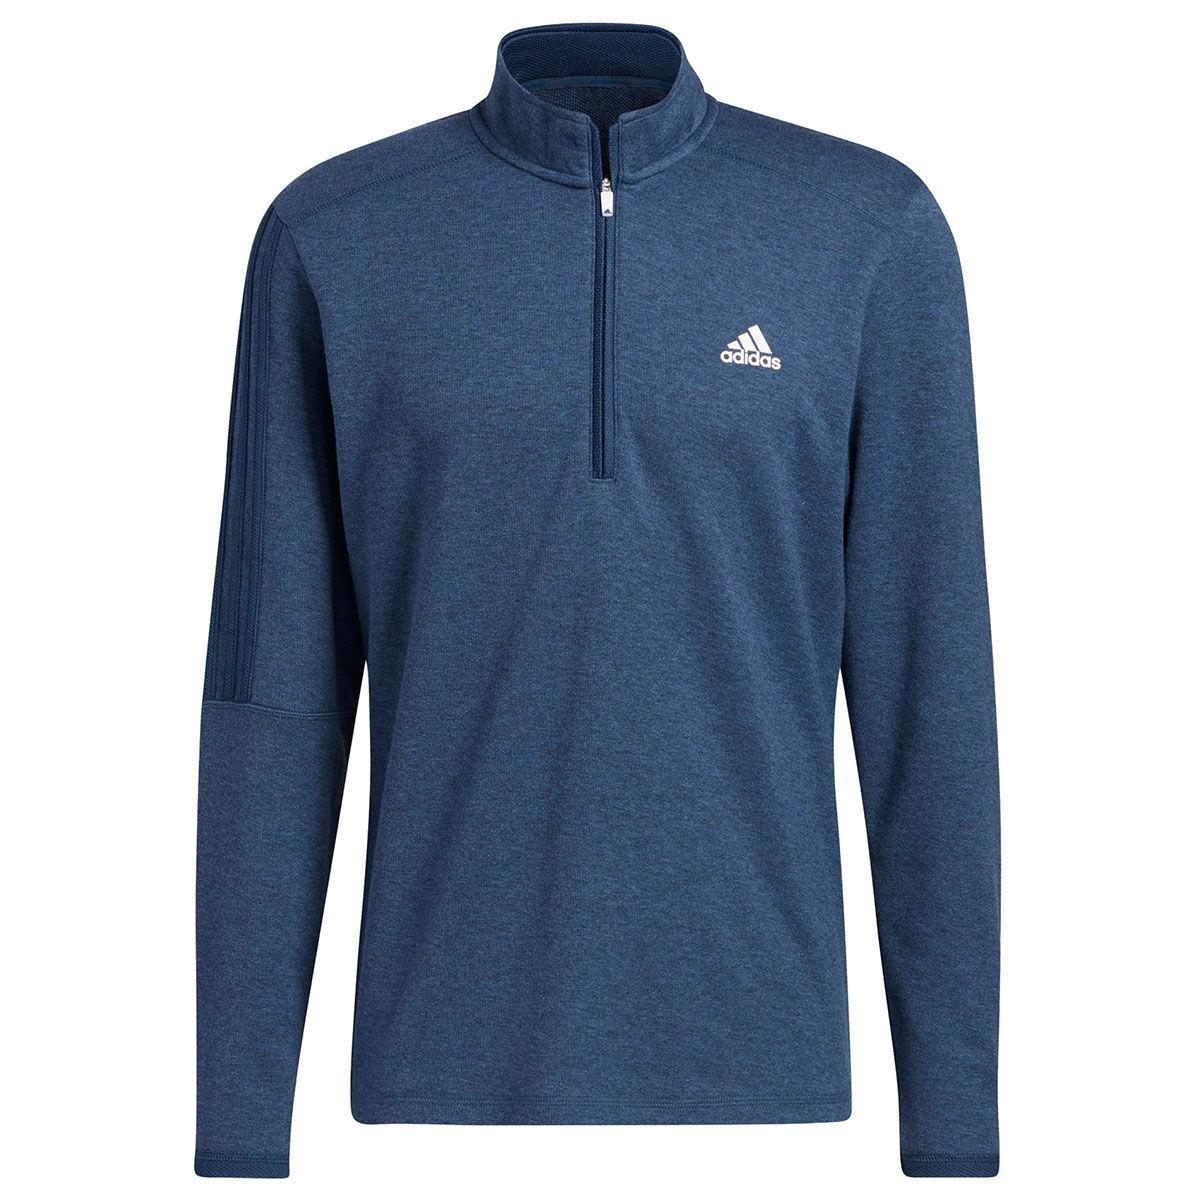 adidas Golf 3-Stripe Left Chest 1/4 Zip Midlayer, Mens, Crew navy, Large | American Golf